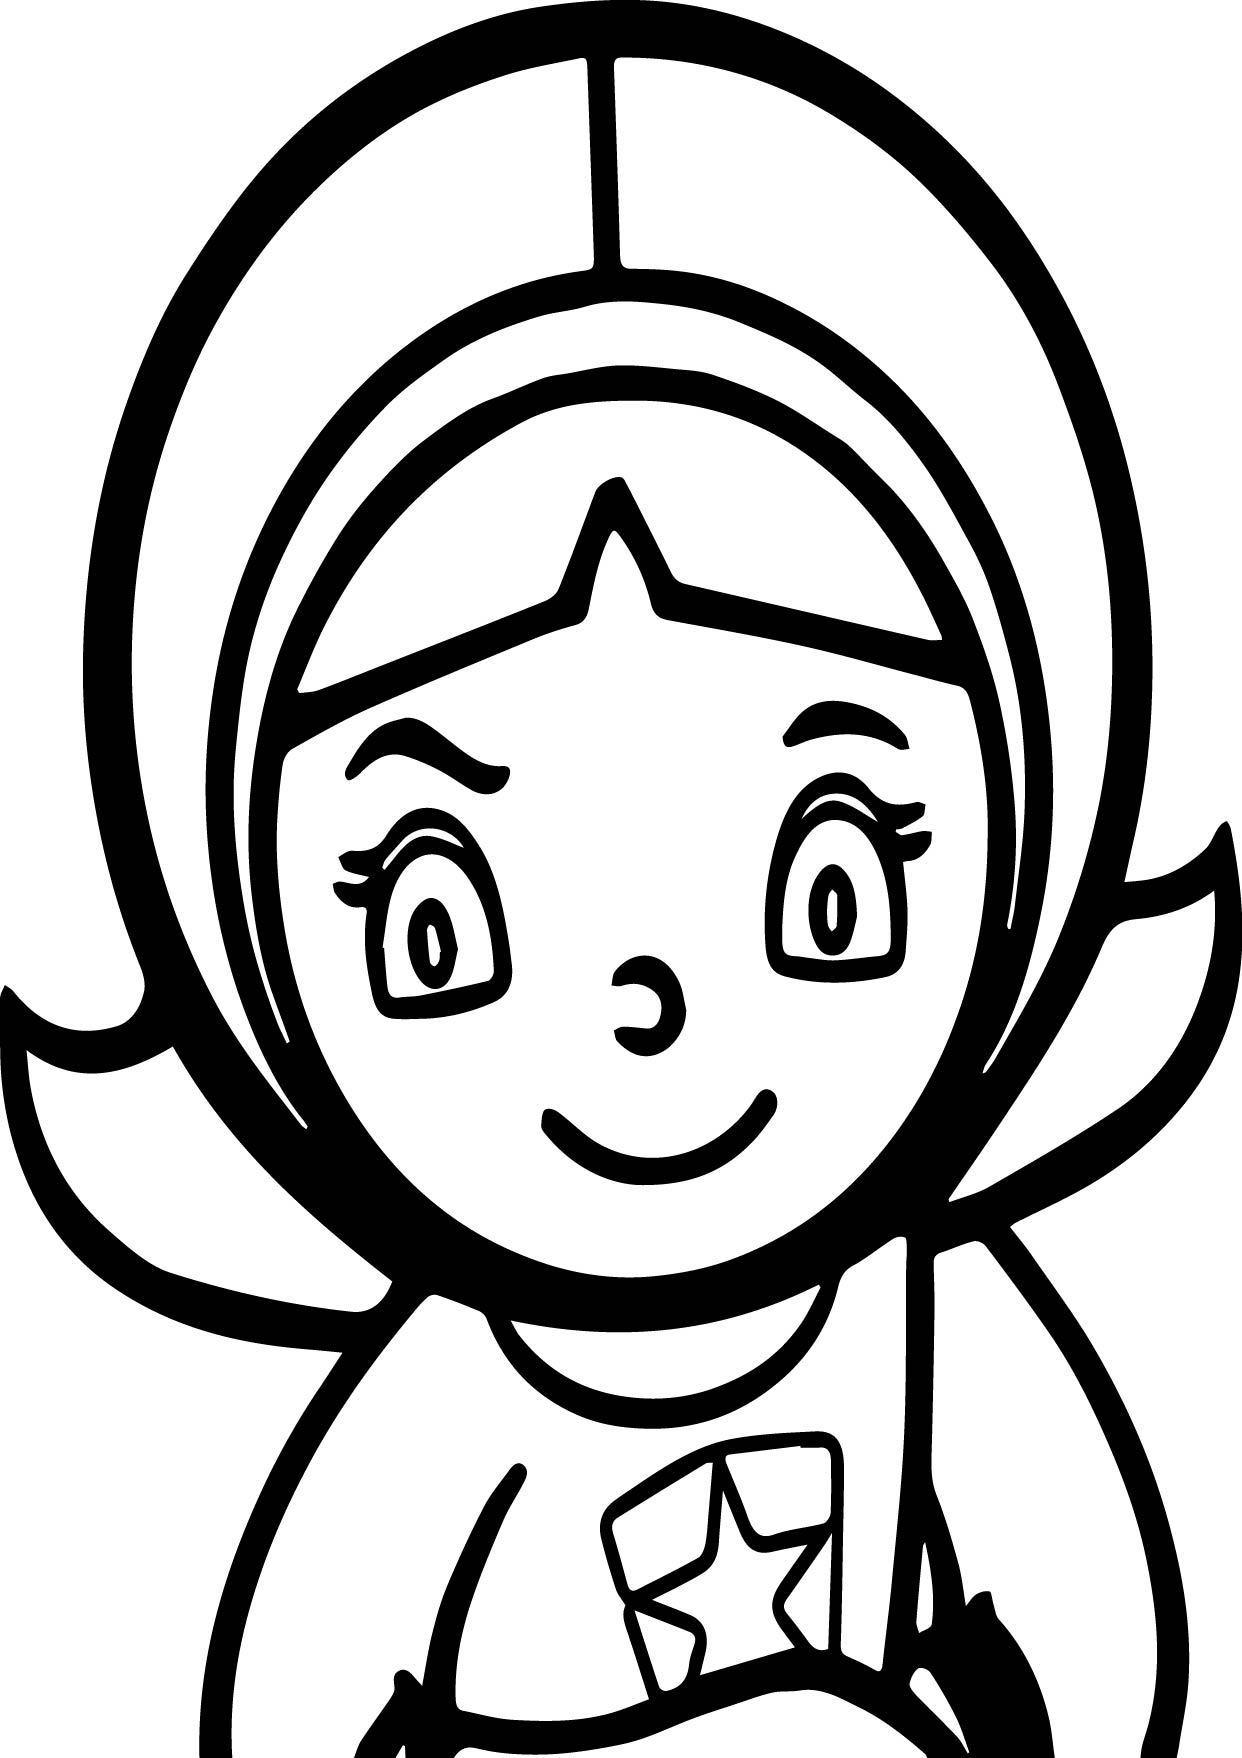 1242x1758 Appealing Image Word Girl Pbs Kids Coloring Page Kart Kingdom